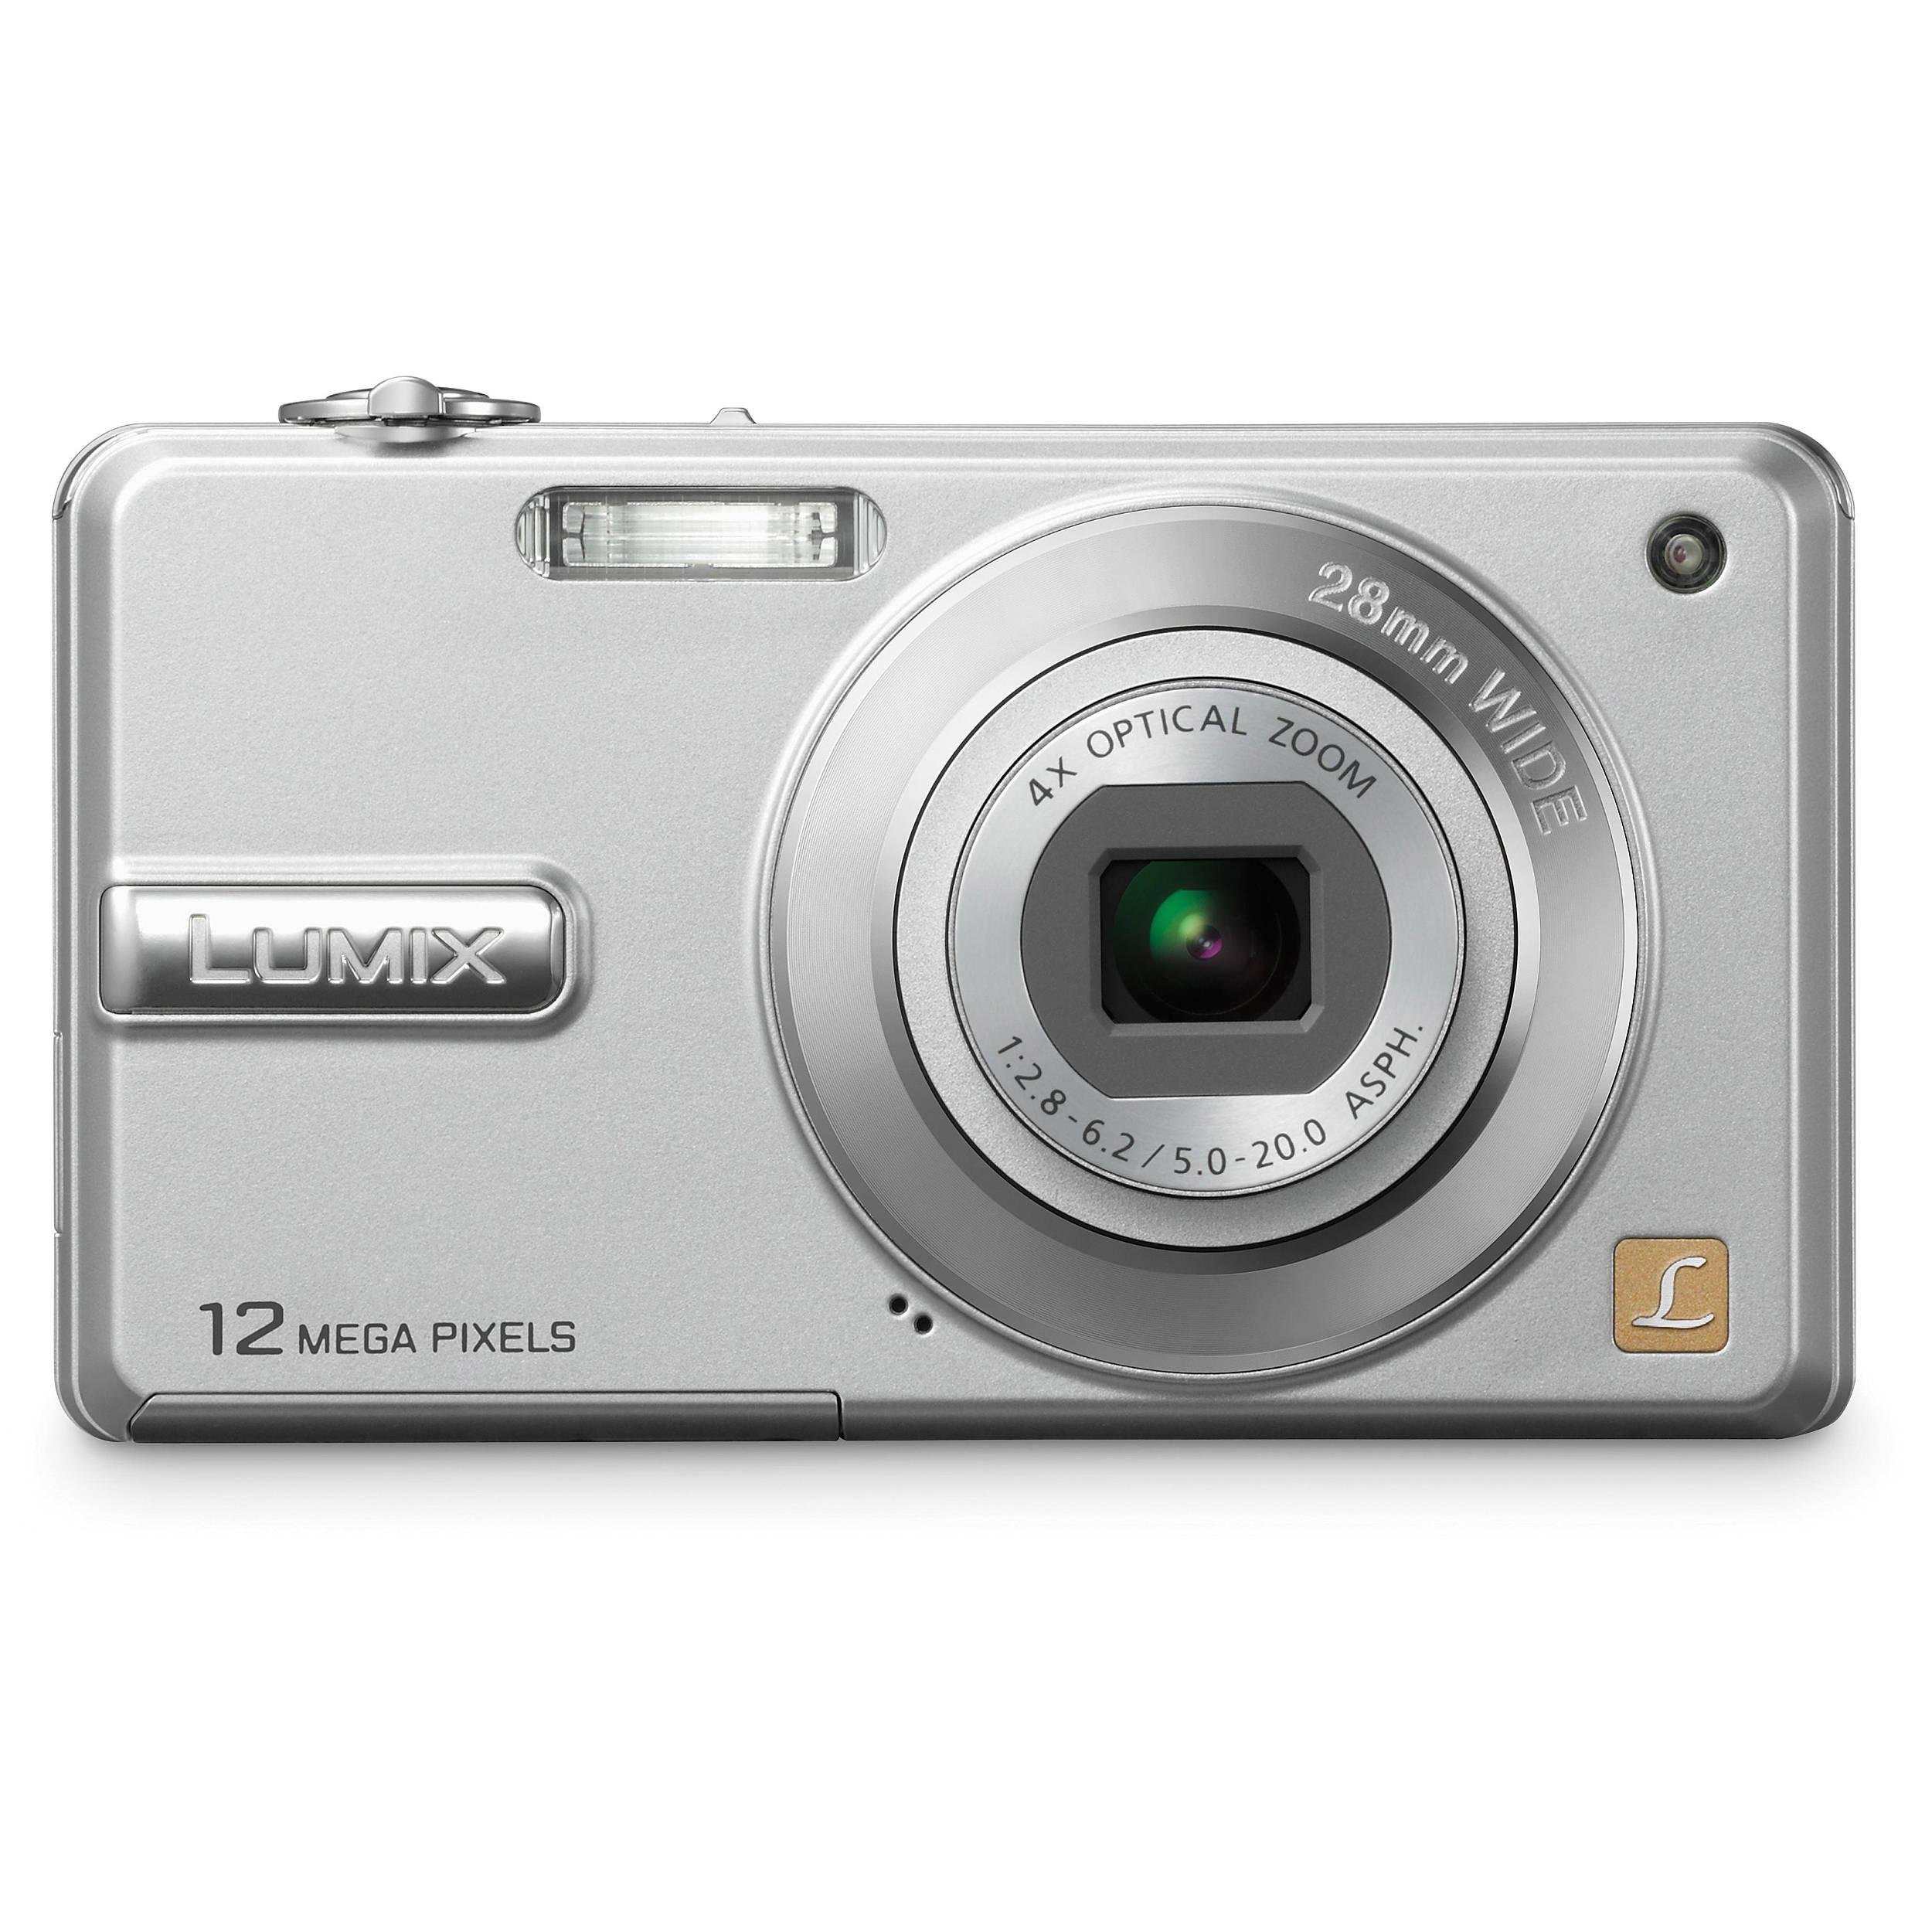 panasonic lumix dmc f3 digital camera silver dmc f3s b h photo rh bhphotovideo com Panasonic TV Manual Panasonic Cordless Phones